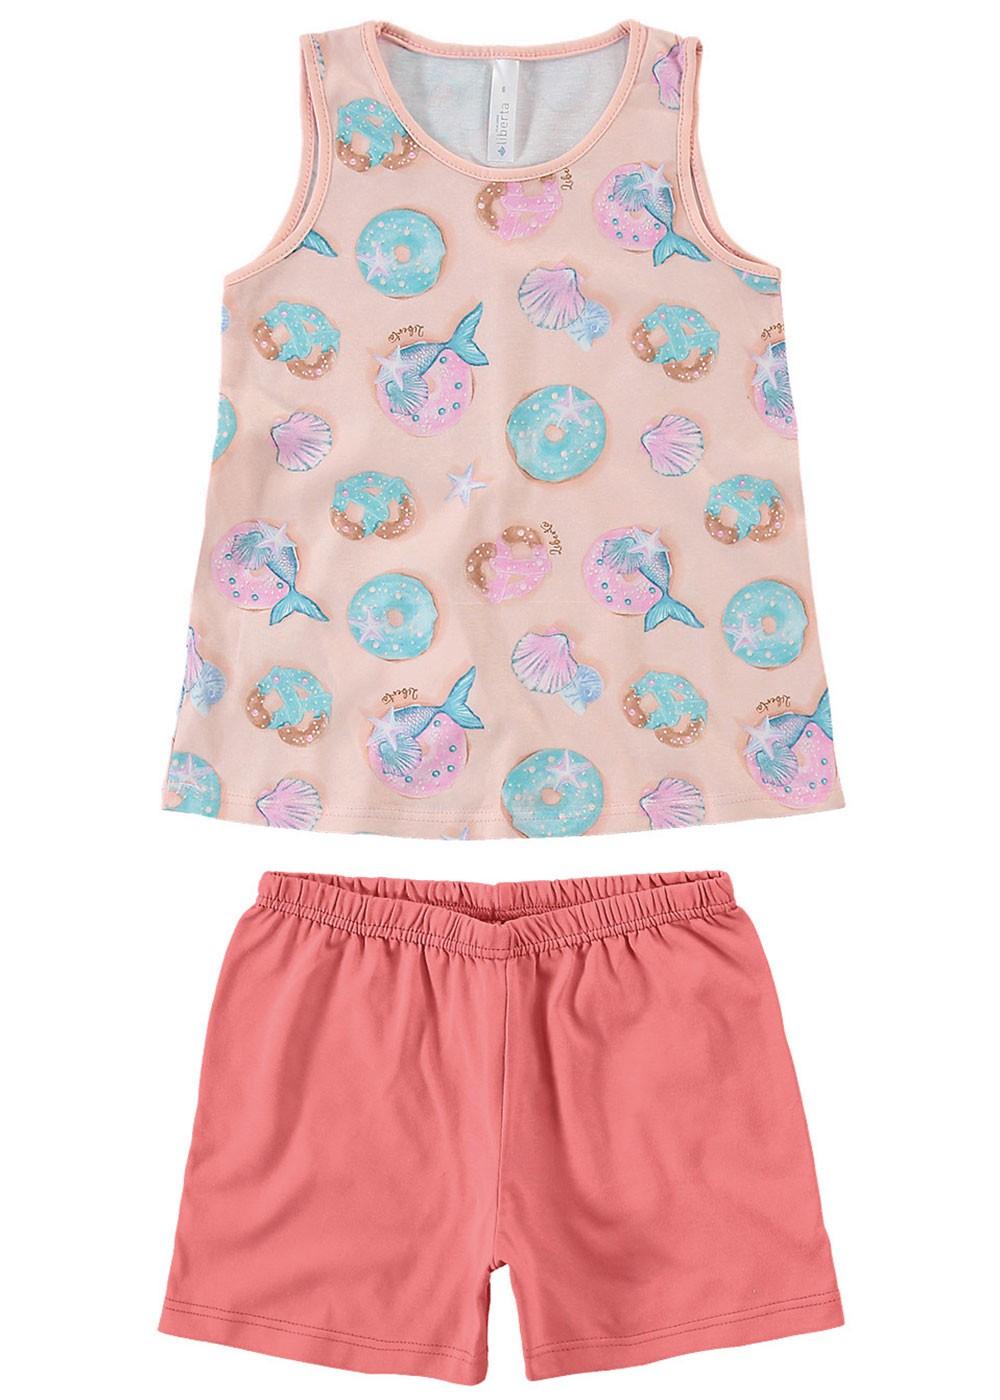 Pijama Feminino Mãe e Filha Short e Regata Rosa Estampa Donuts - Malwee